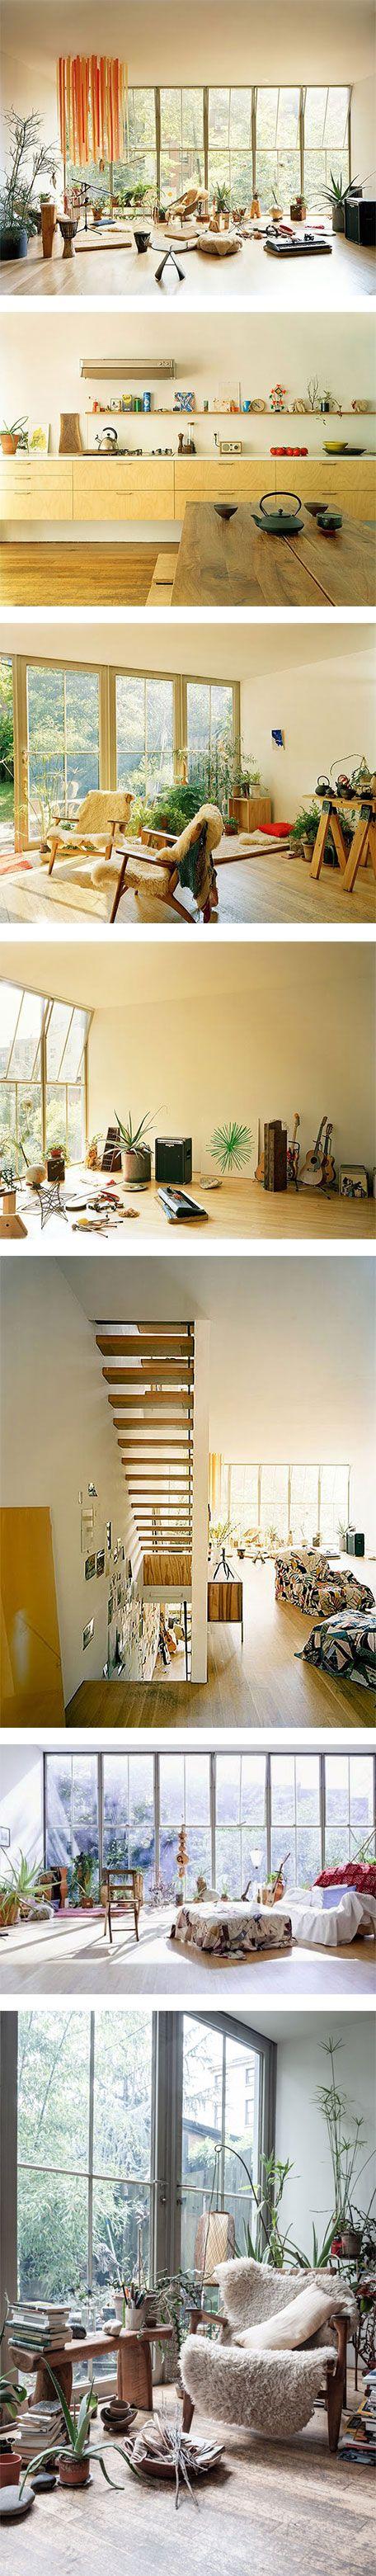 Photographer Mark Borthwick's house in Brooklyn on Nuji.com #interiordesign…